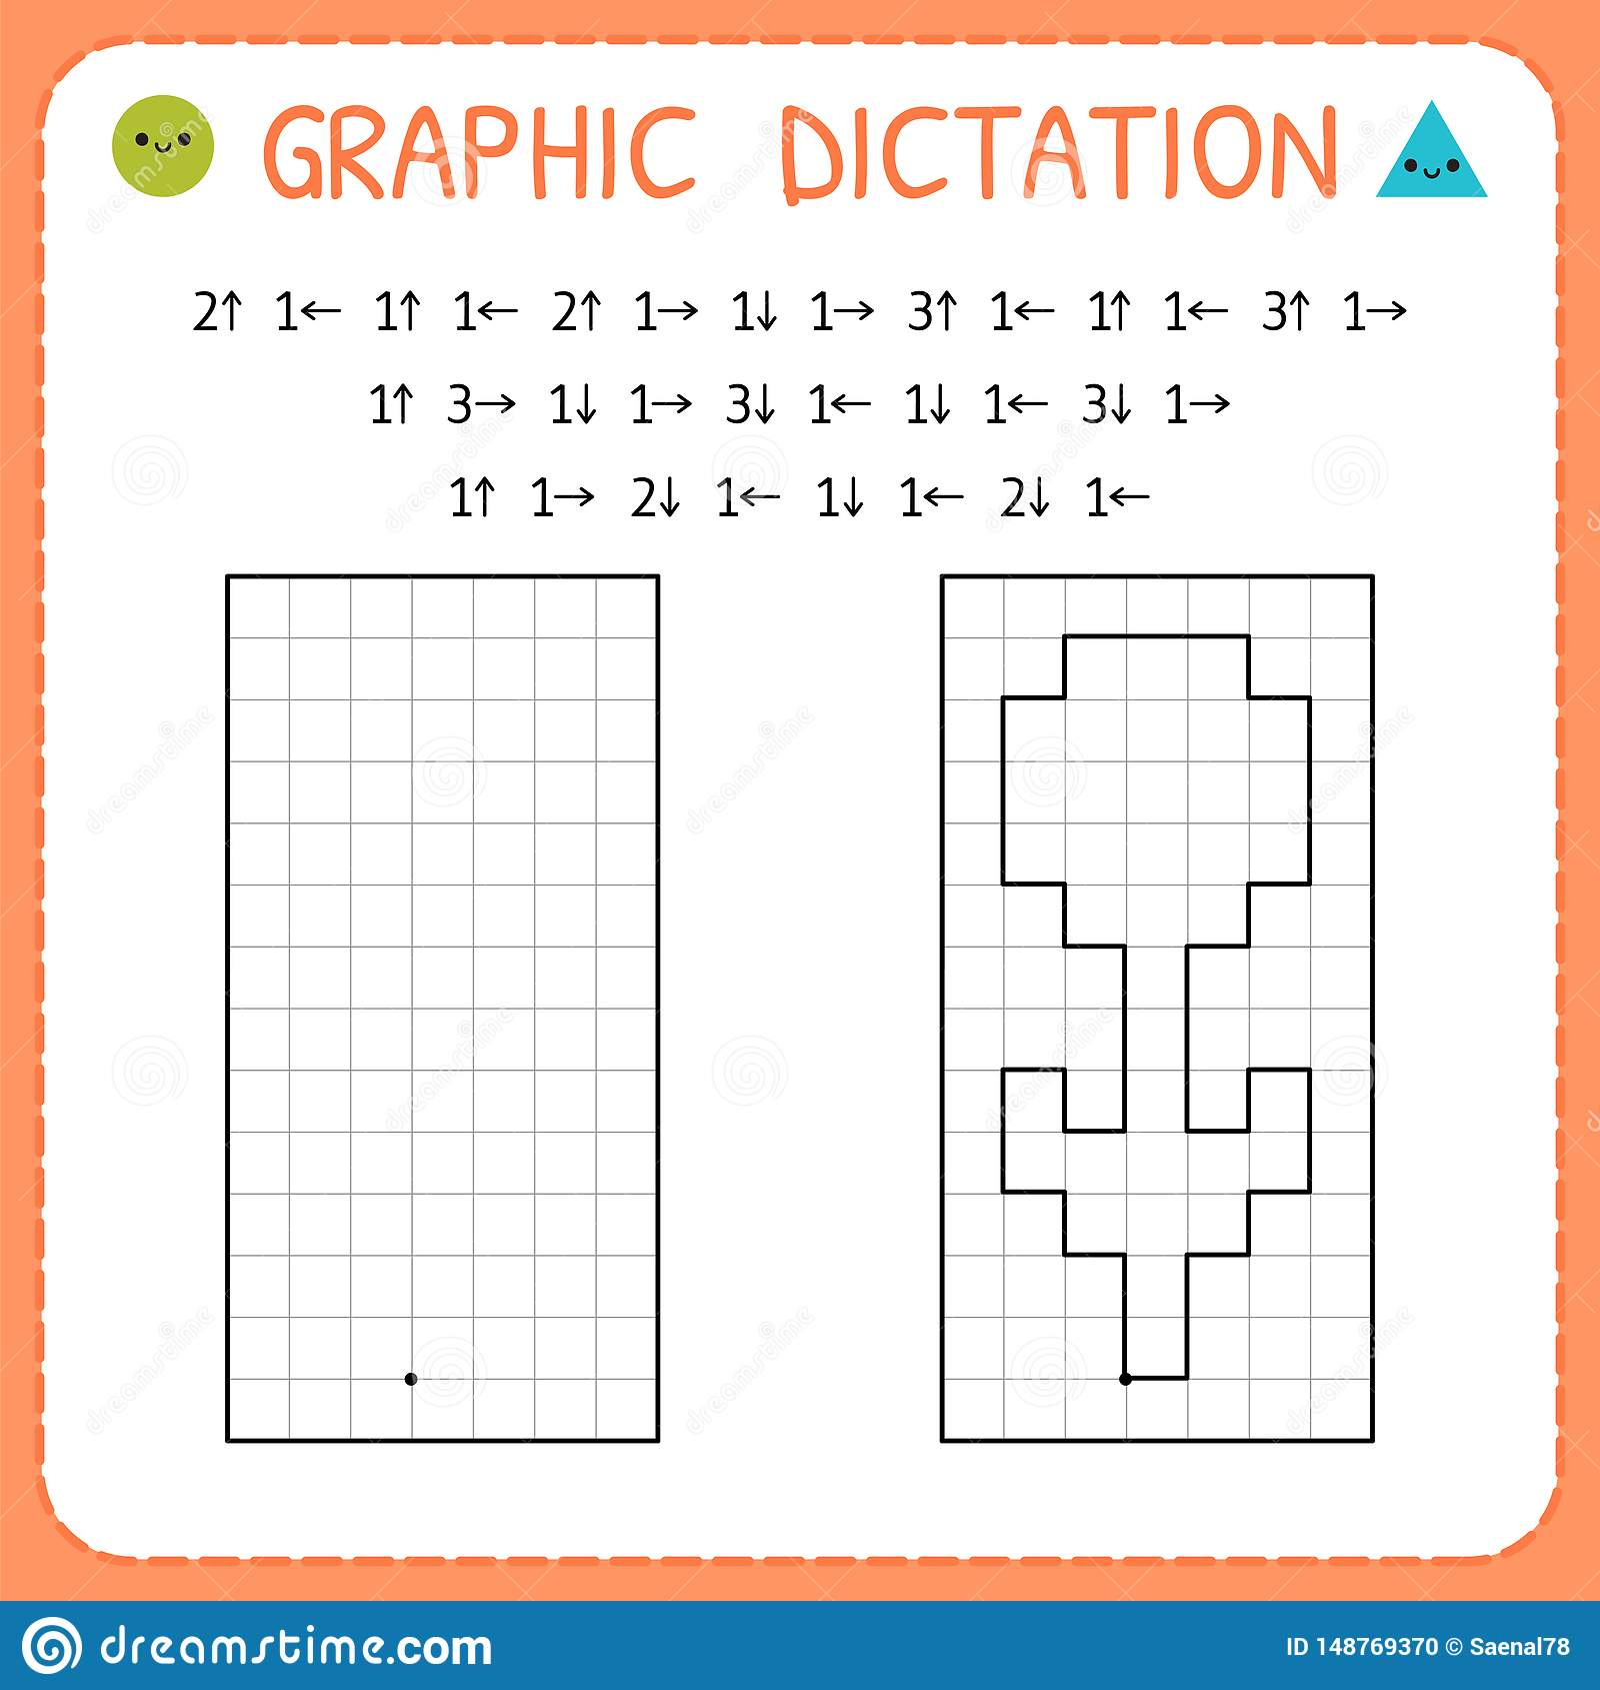 Graphic Dictation Flower Kindergarten Educational Game